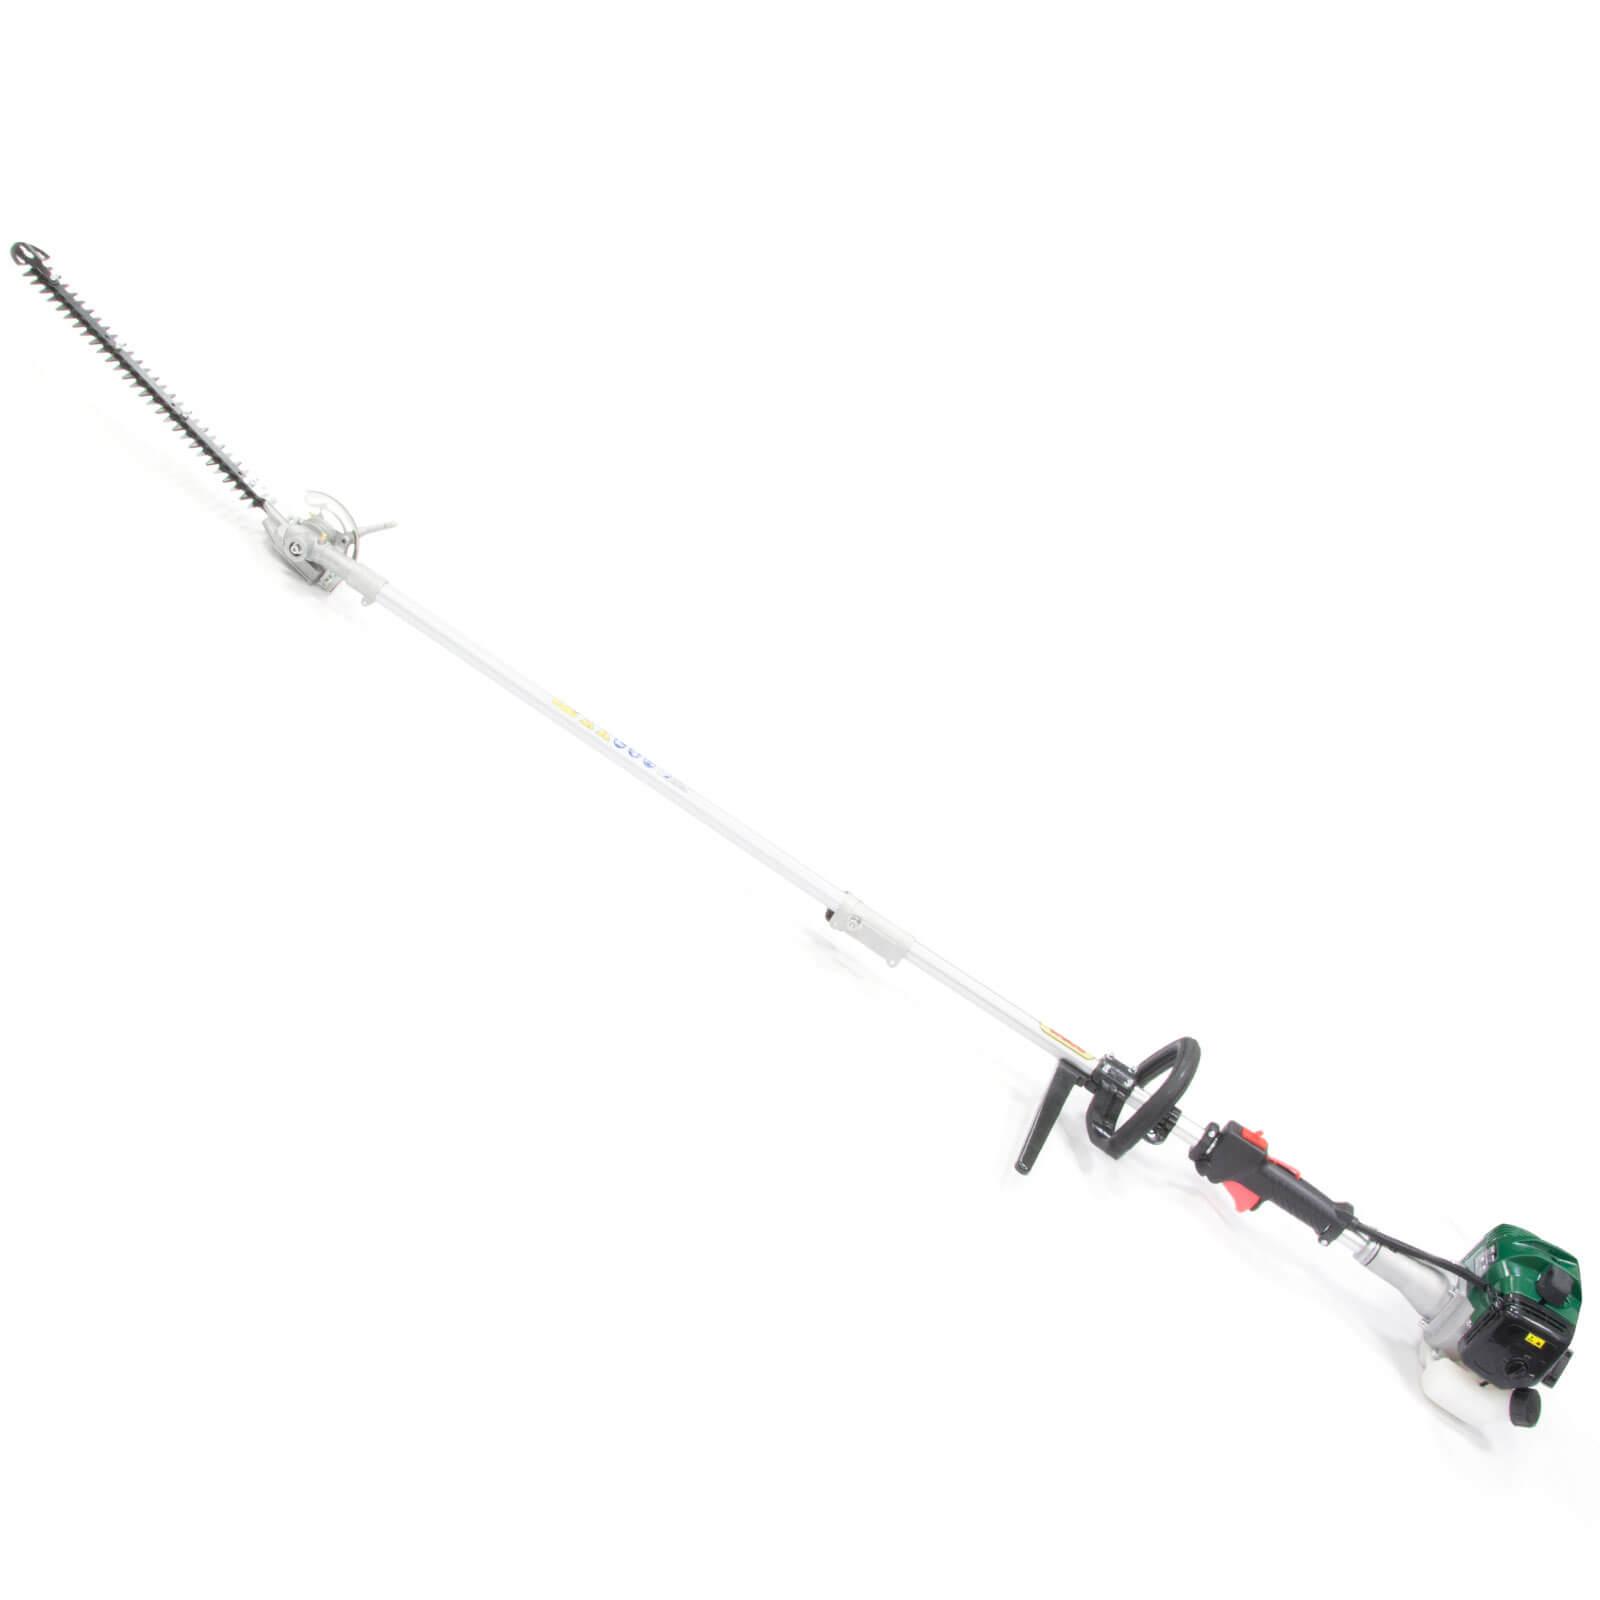 Webb WEPHT26 Split Shaft Long Petrol Hedge Trimmer 430mm FREE Lubricant, Safety Glasses & Gloves Worth �10.99